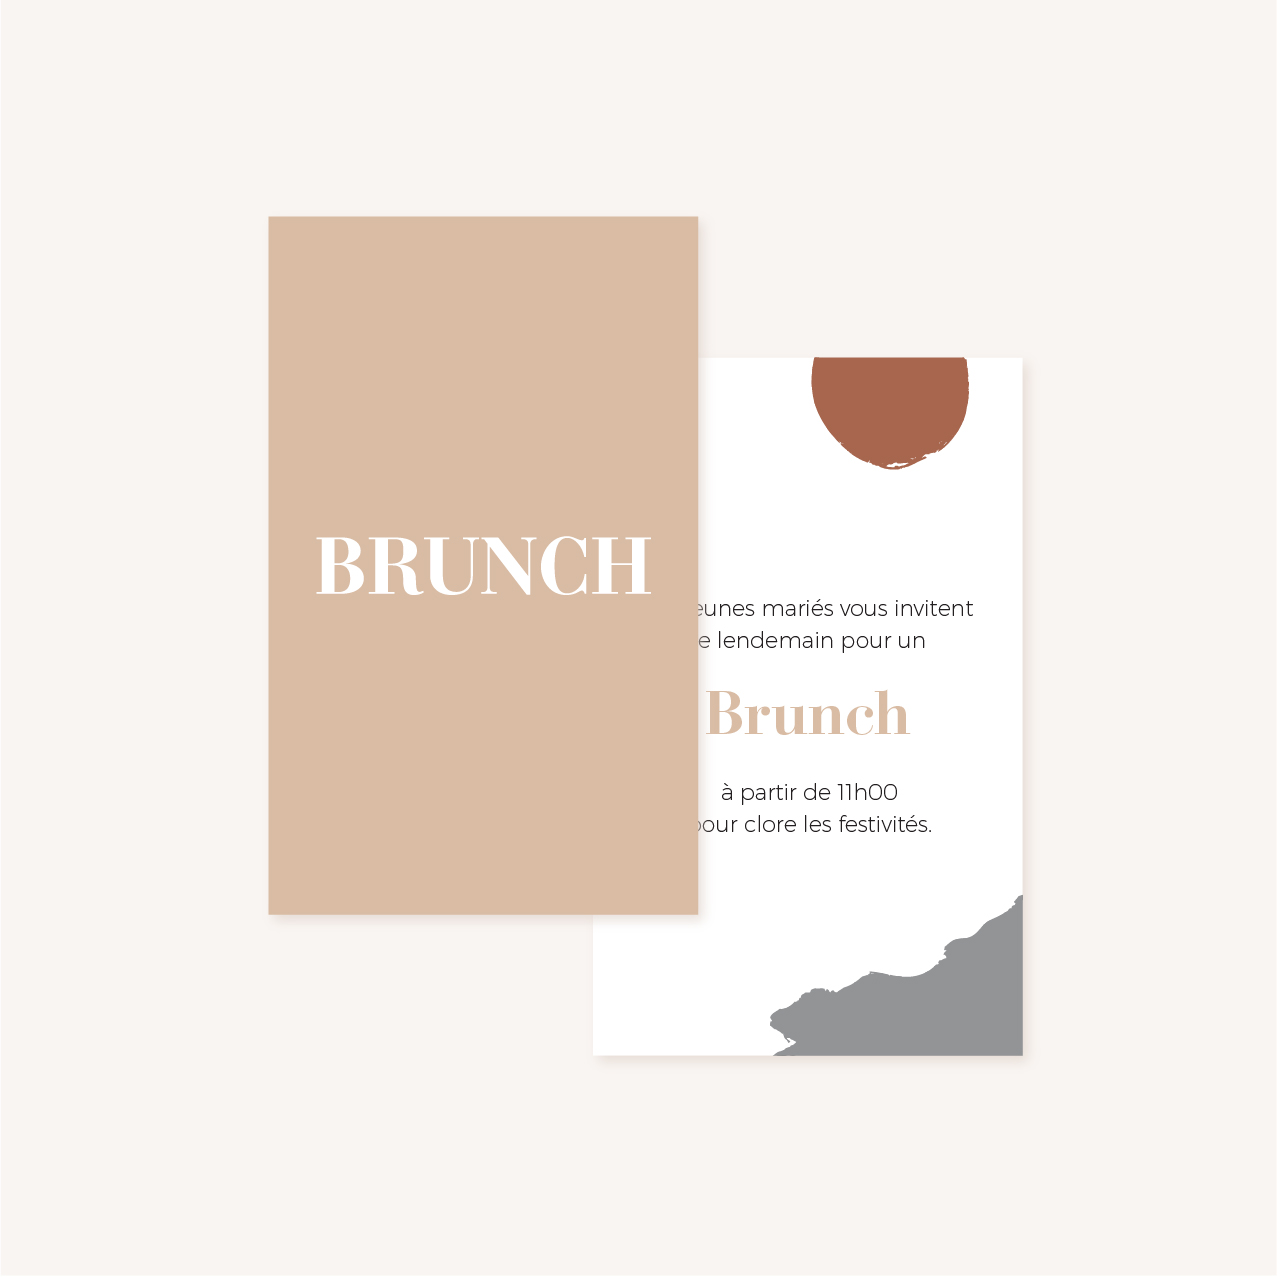 brunch-mariage-abstrait-boho-sahara-couleur-sable-terracotta-beige-desert-25